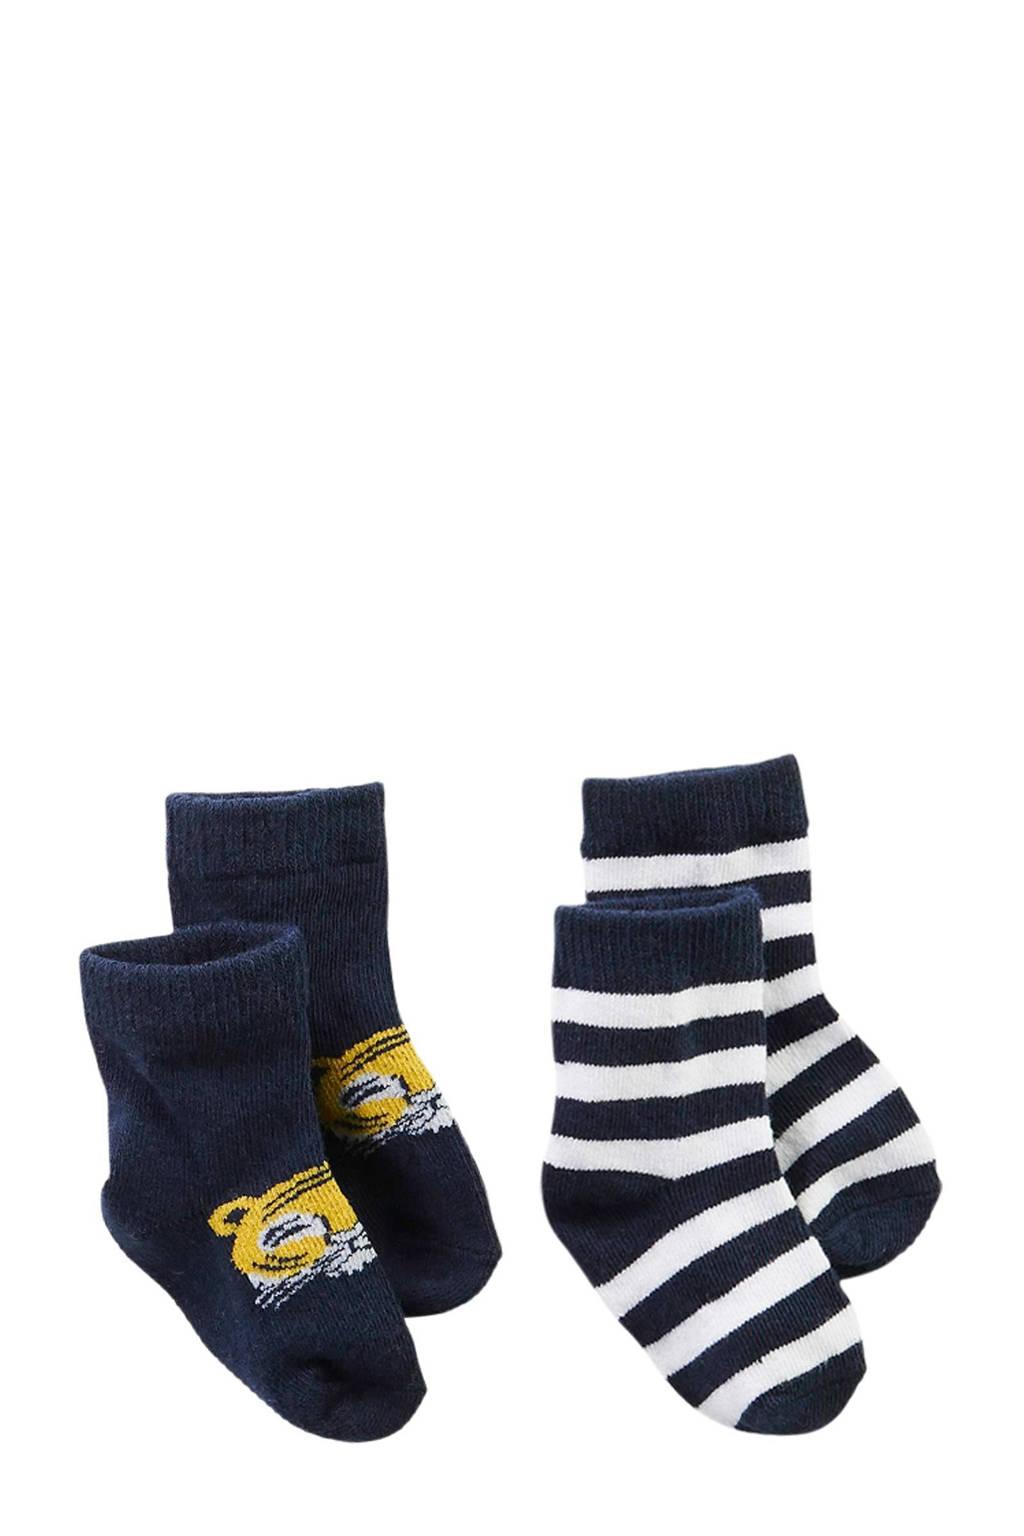 Z8 newborn baby sokken Earth, Marine